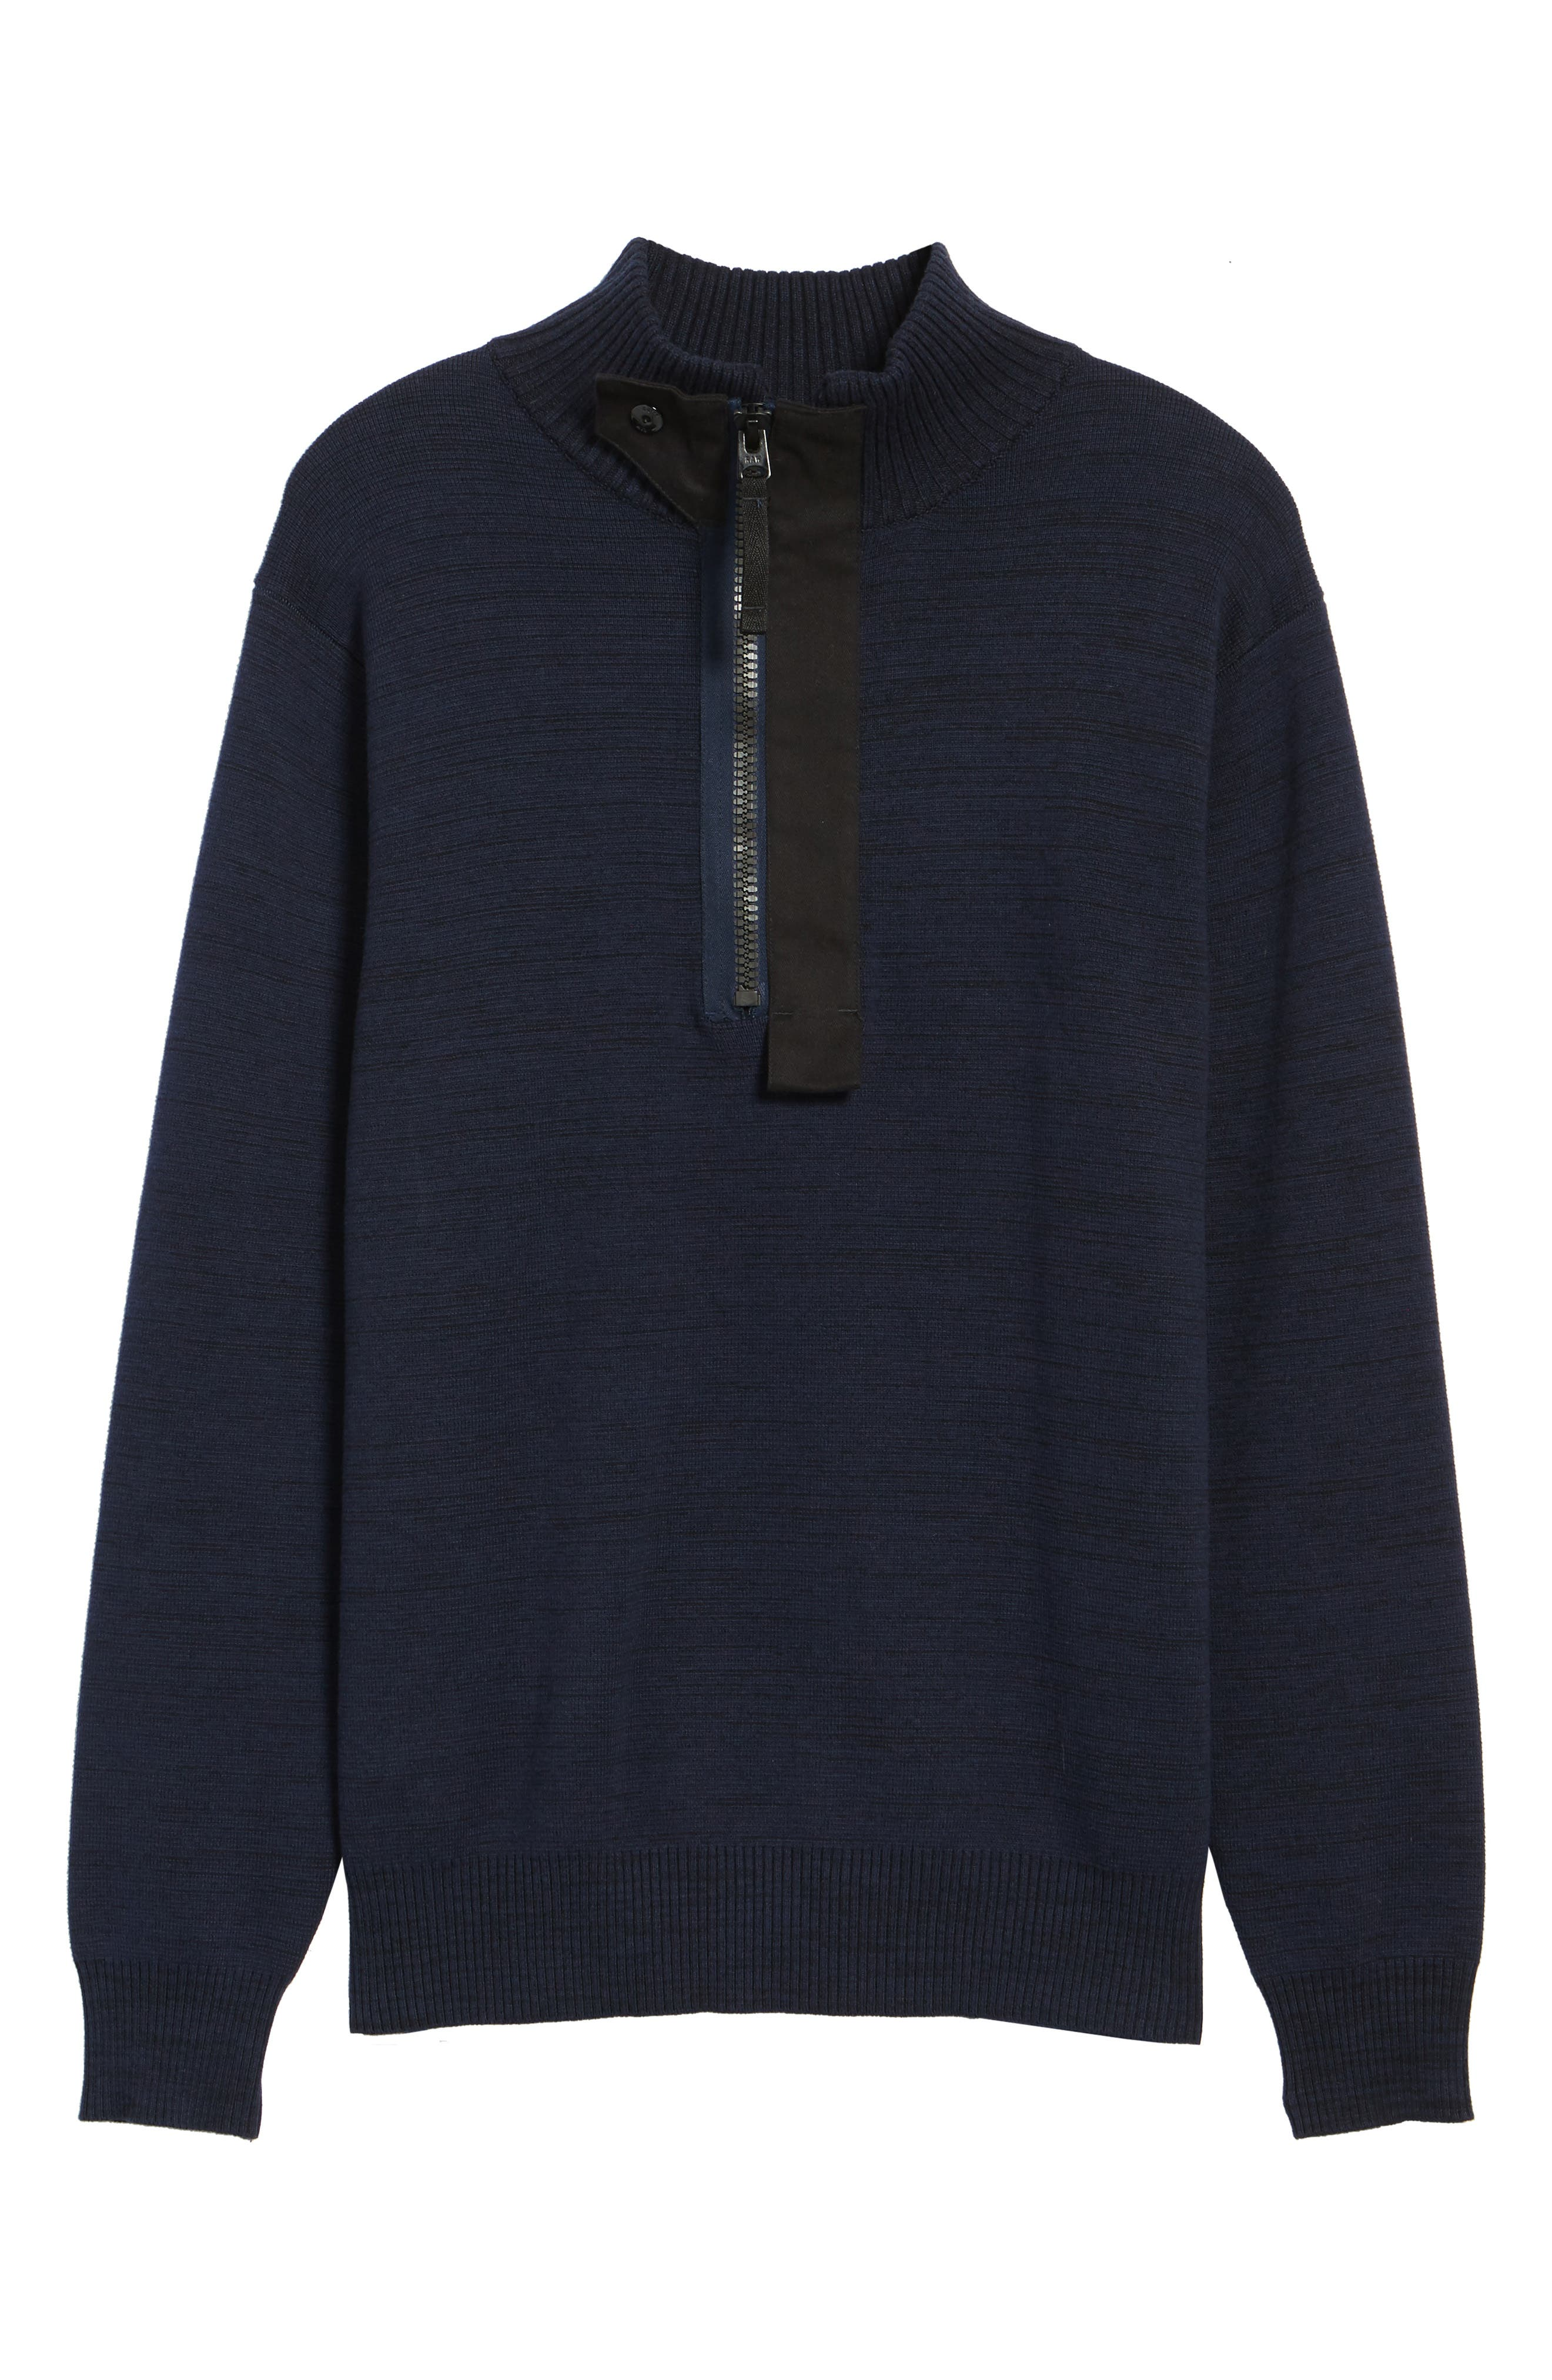 Empral Half-Zip Sweater,                             Alternate thumbnail 6, color,                             Blue/ Dark Black